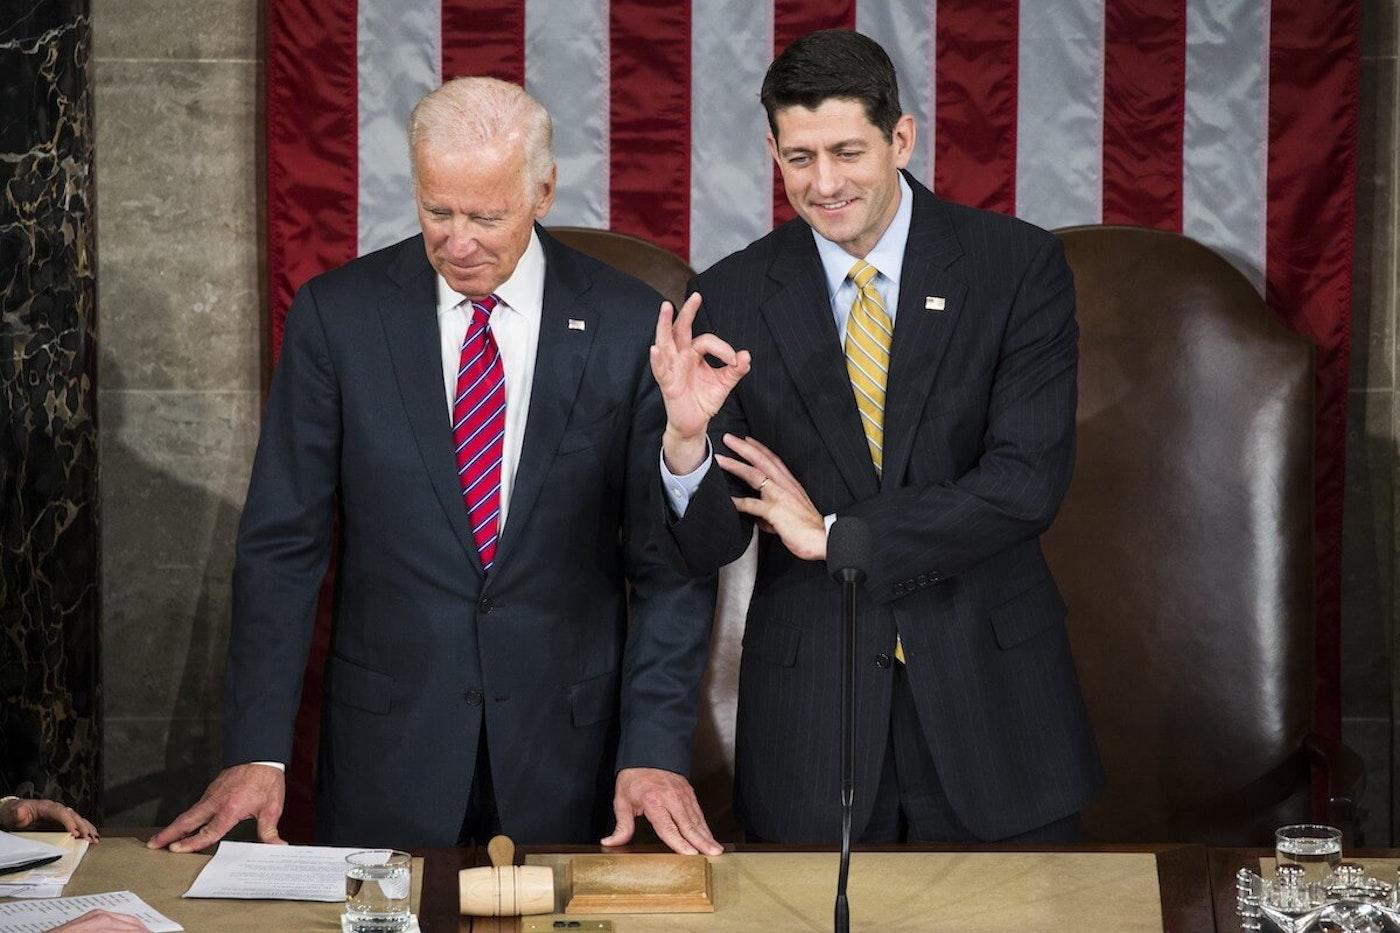 Electoral College Votes Delivered to Congress